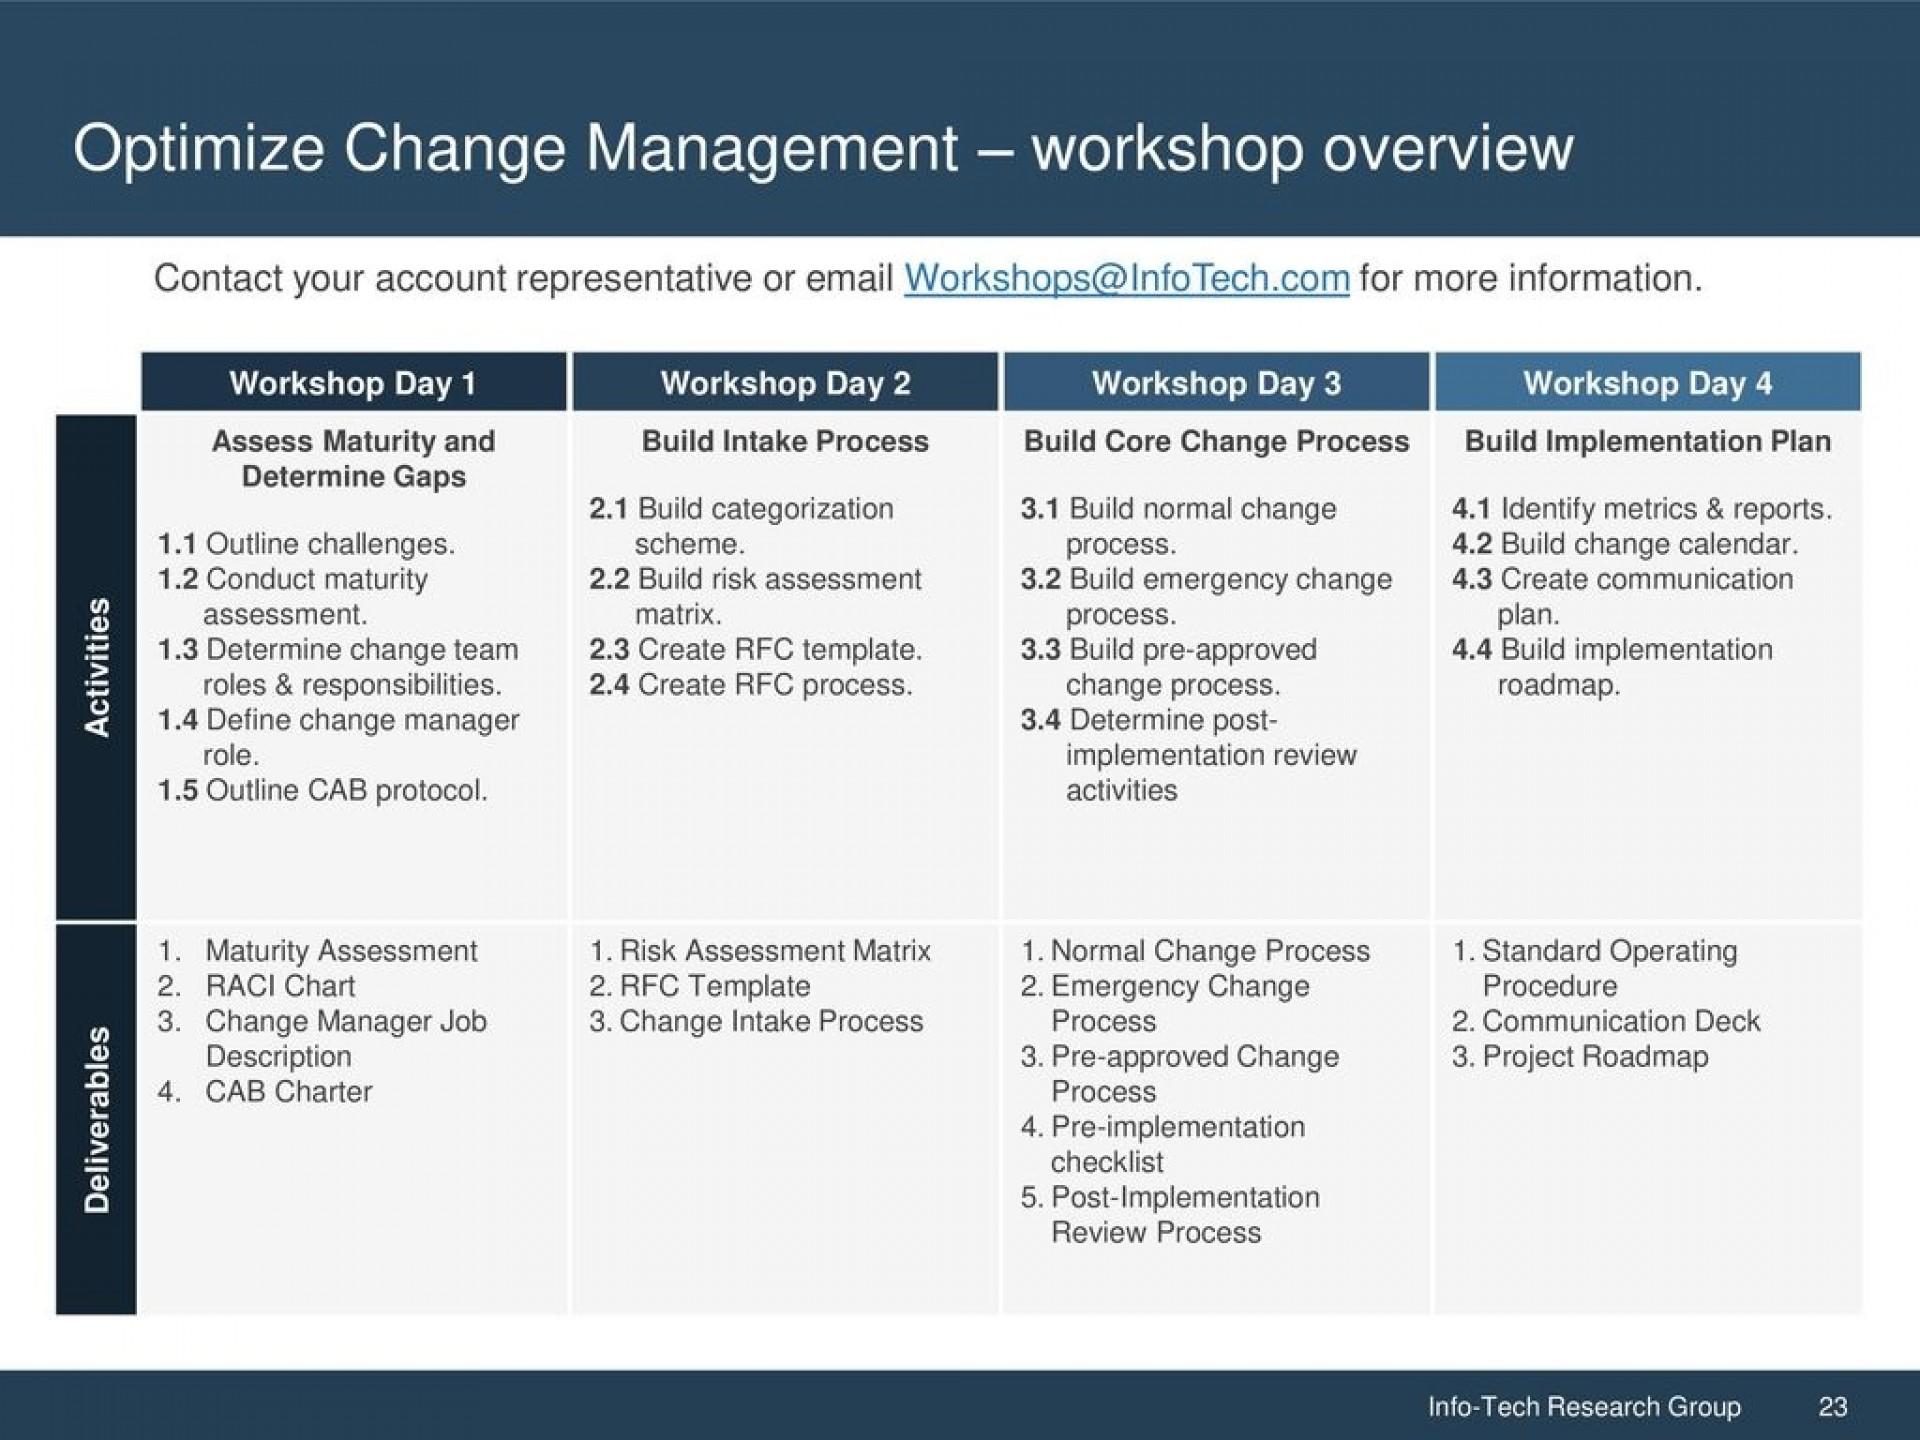 009 Fascinating Change Management Proces Template Idea 1920